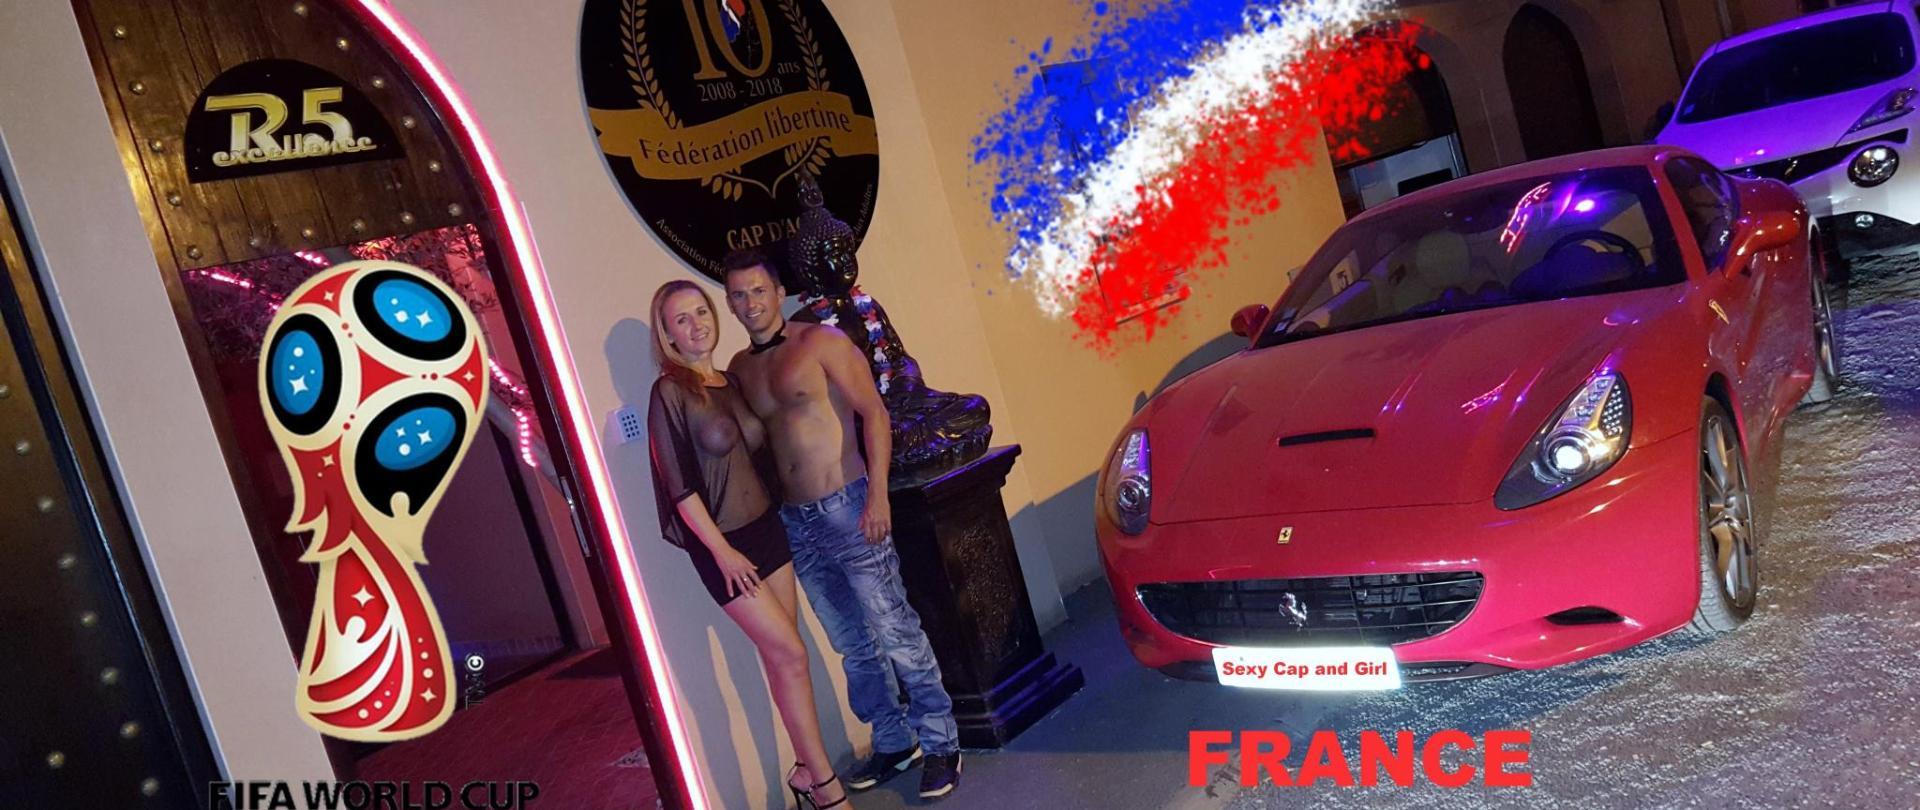 FRANCE CHAMPION DU MONDE.jpg